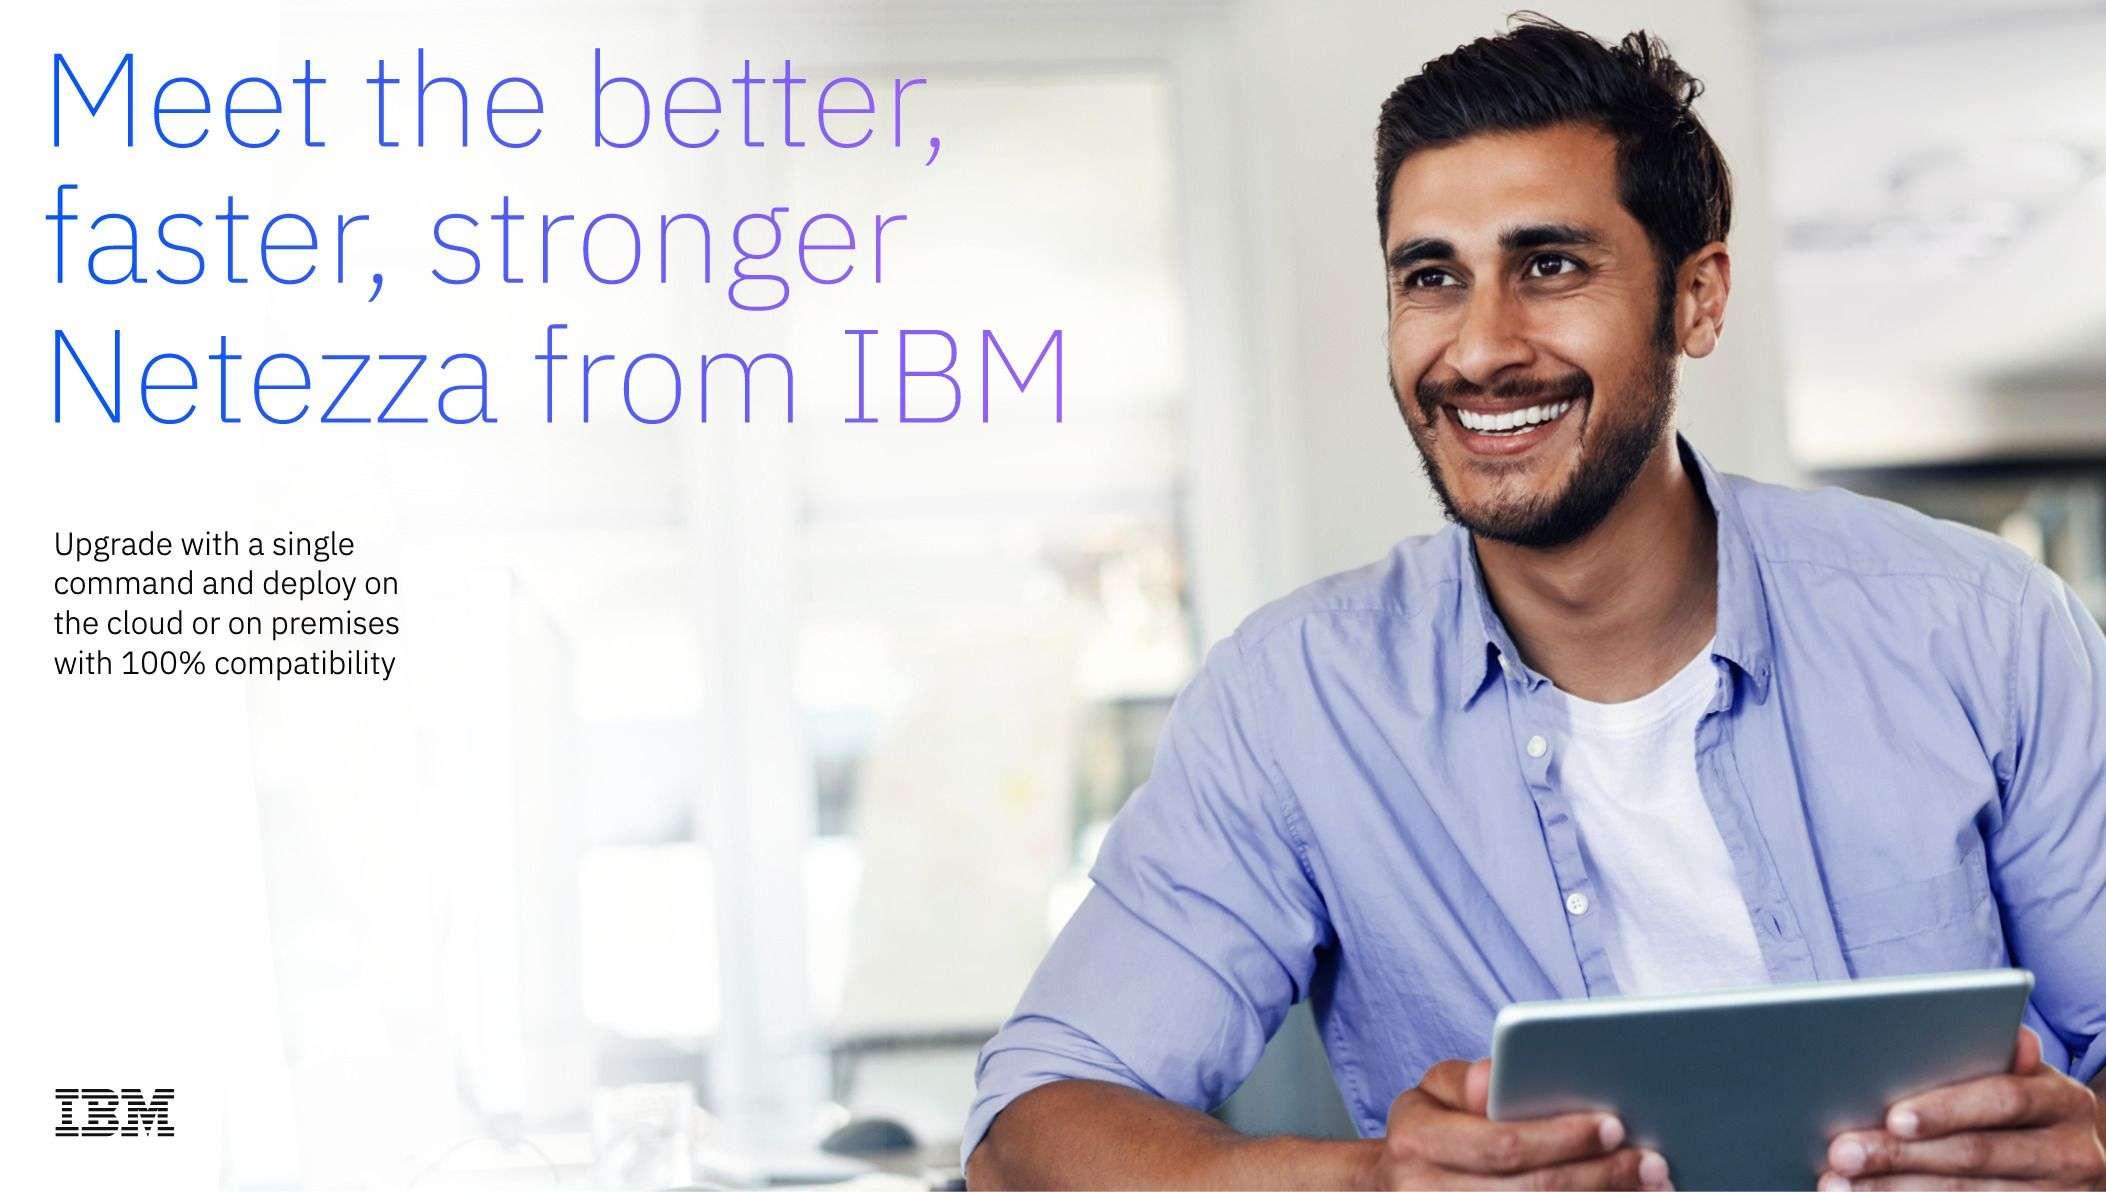 Screenshot 2020 10 20 Meet the better faster stronger Netezza from IBM WEK04KWM - Netezza Performance Server Migration Guide - Meet the better, faster, stronger Netezza from IBM